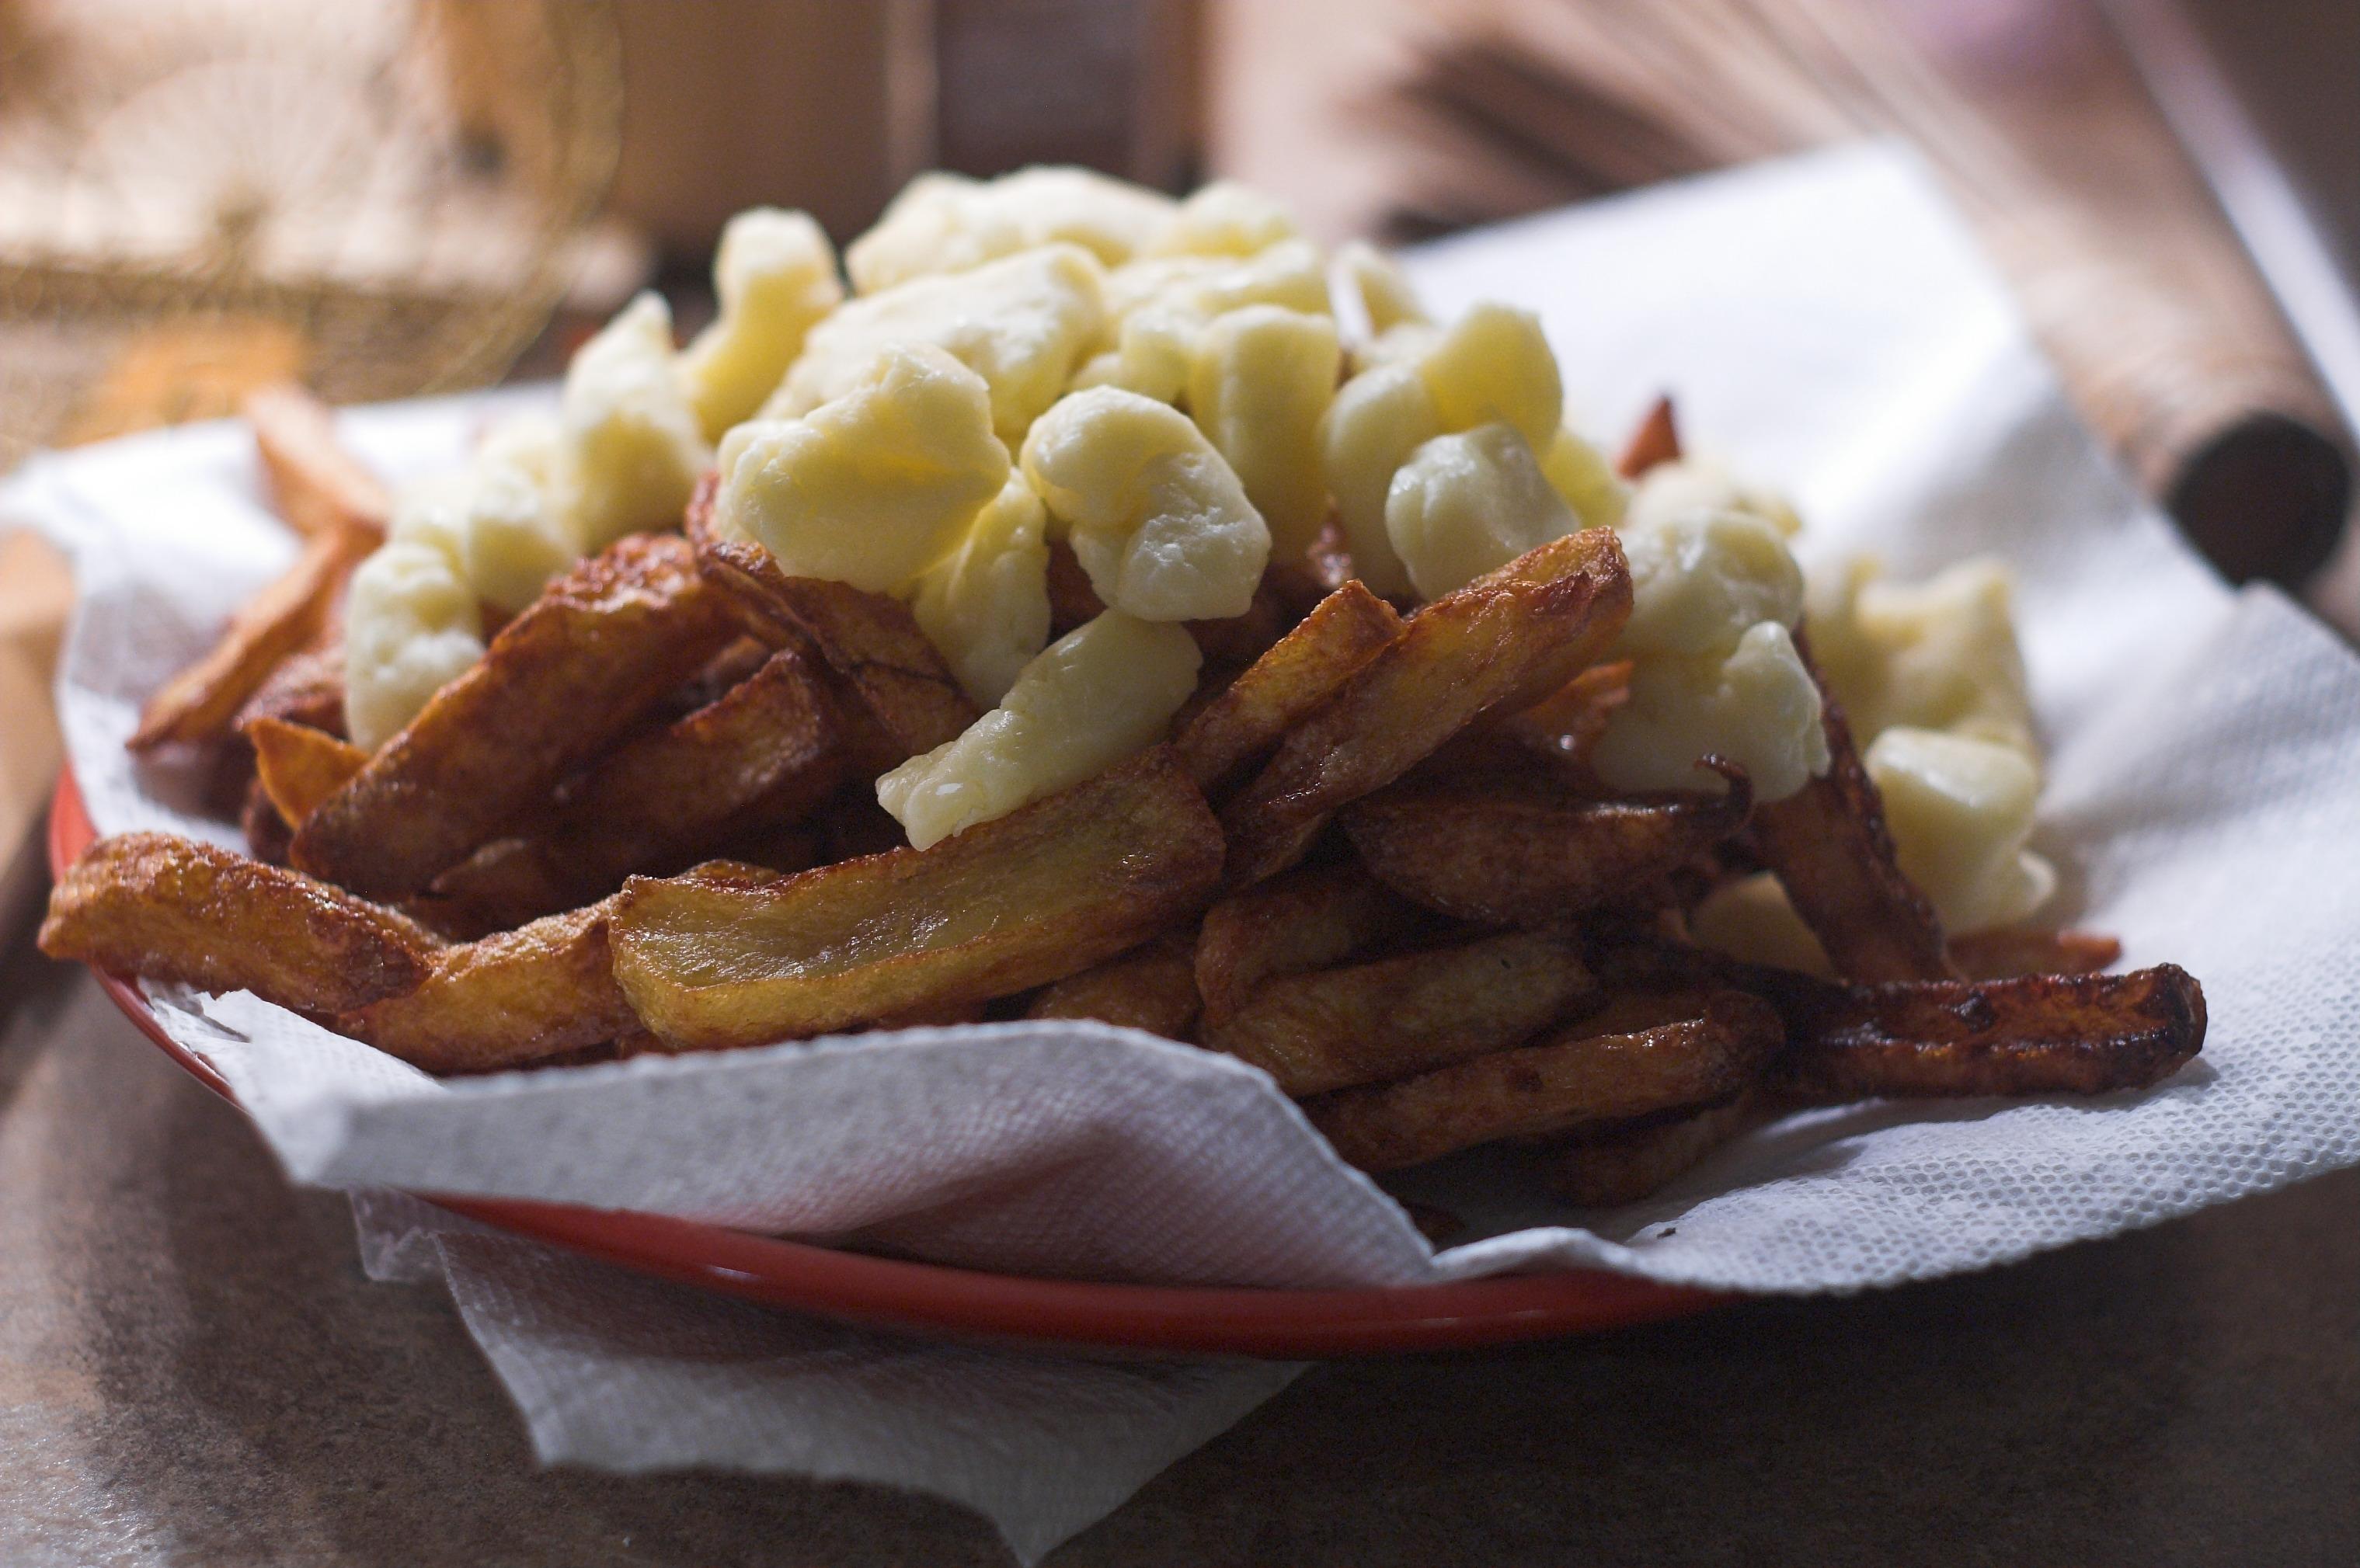 Cookingaround : Poutine Gravy Recipe |Canned Poutine Sauce